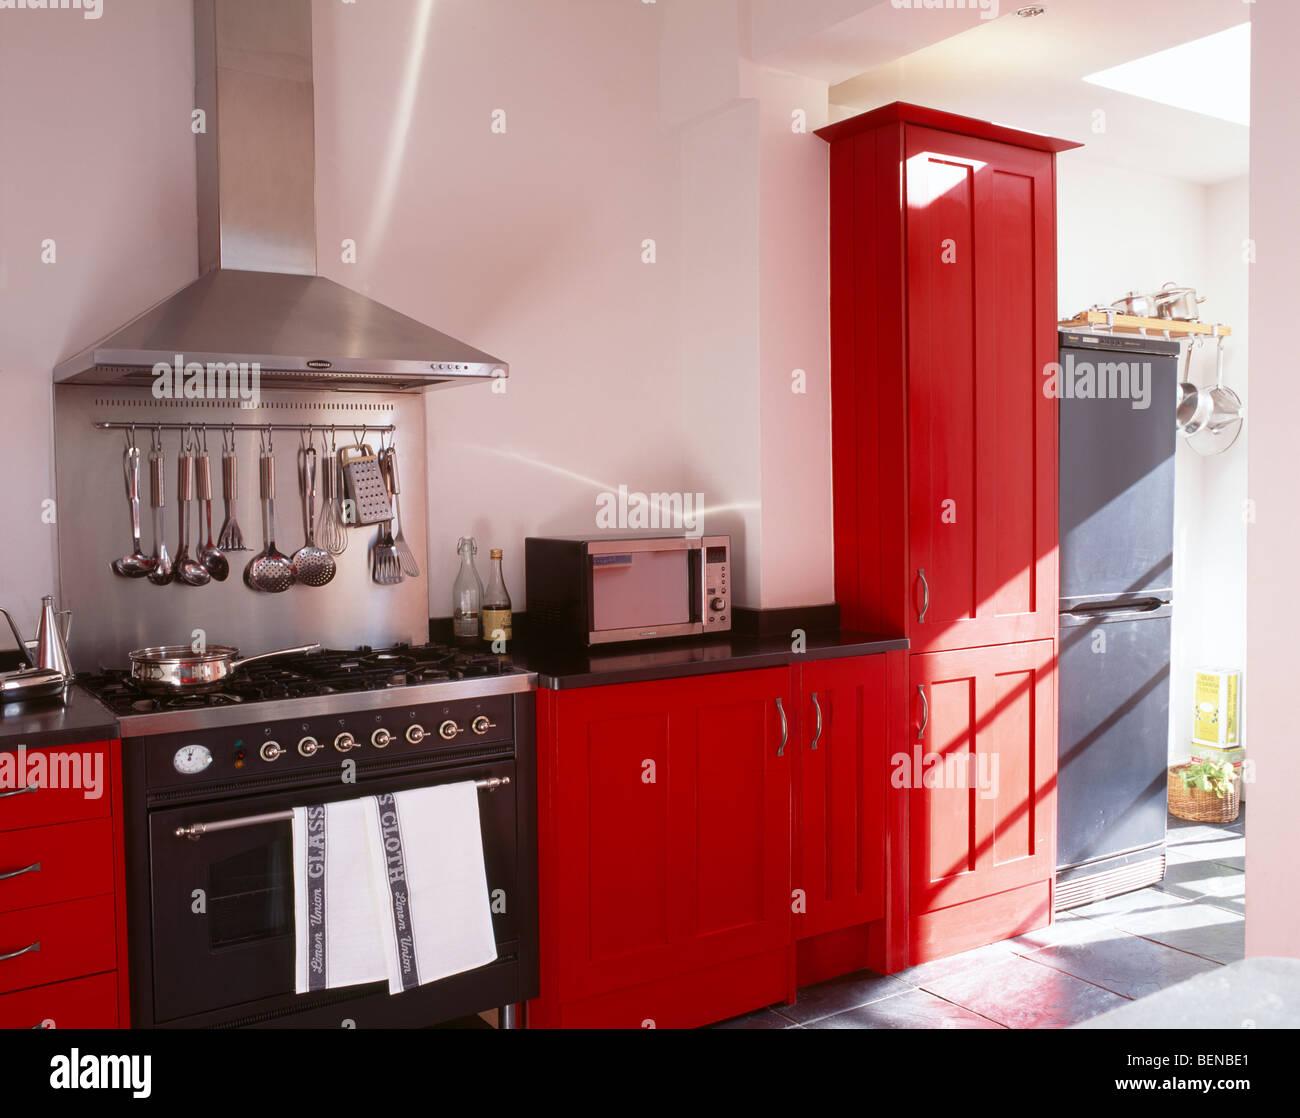 White Kitchen Red Splashback stainless steel extractor and splash-back above black range oven